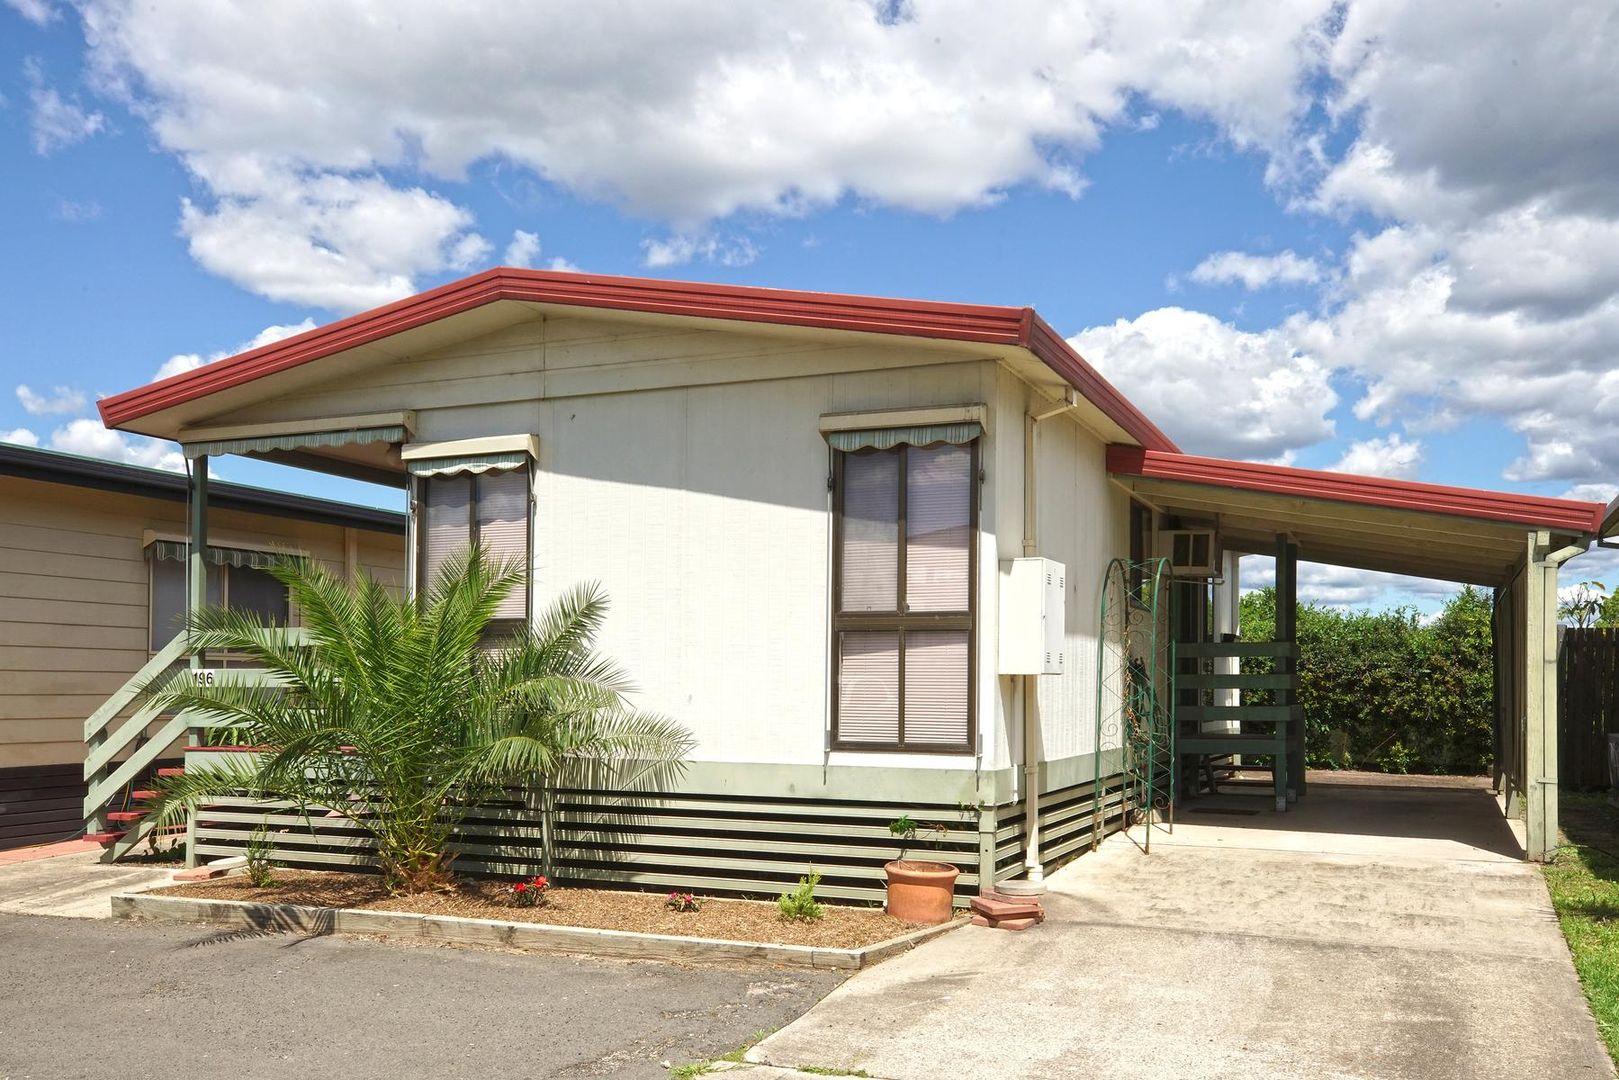 196/6-22 Tench Avenue, Jamisontown NSW 2750, Image 1